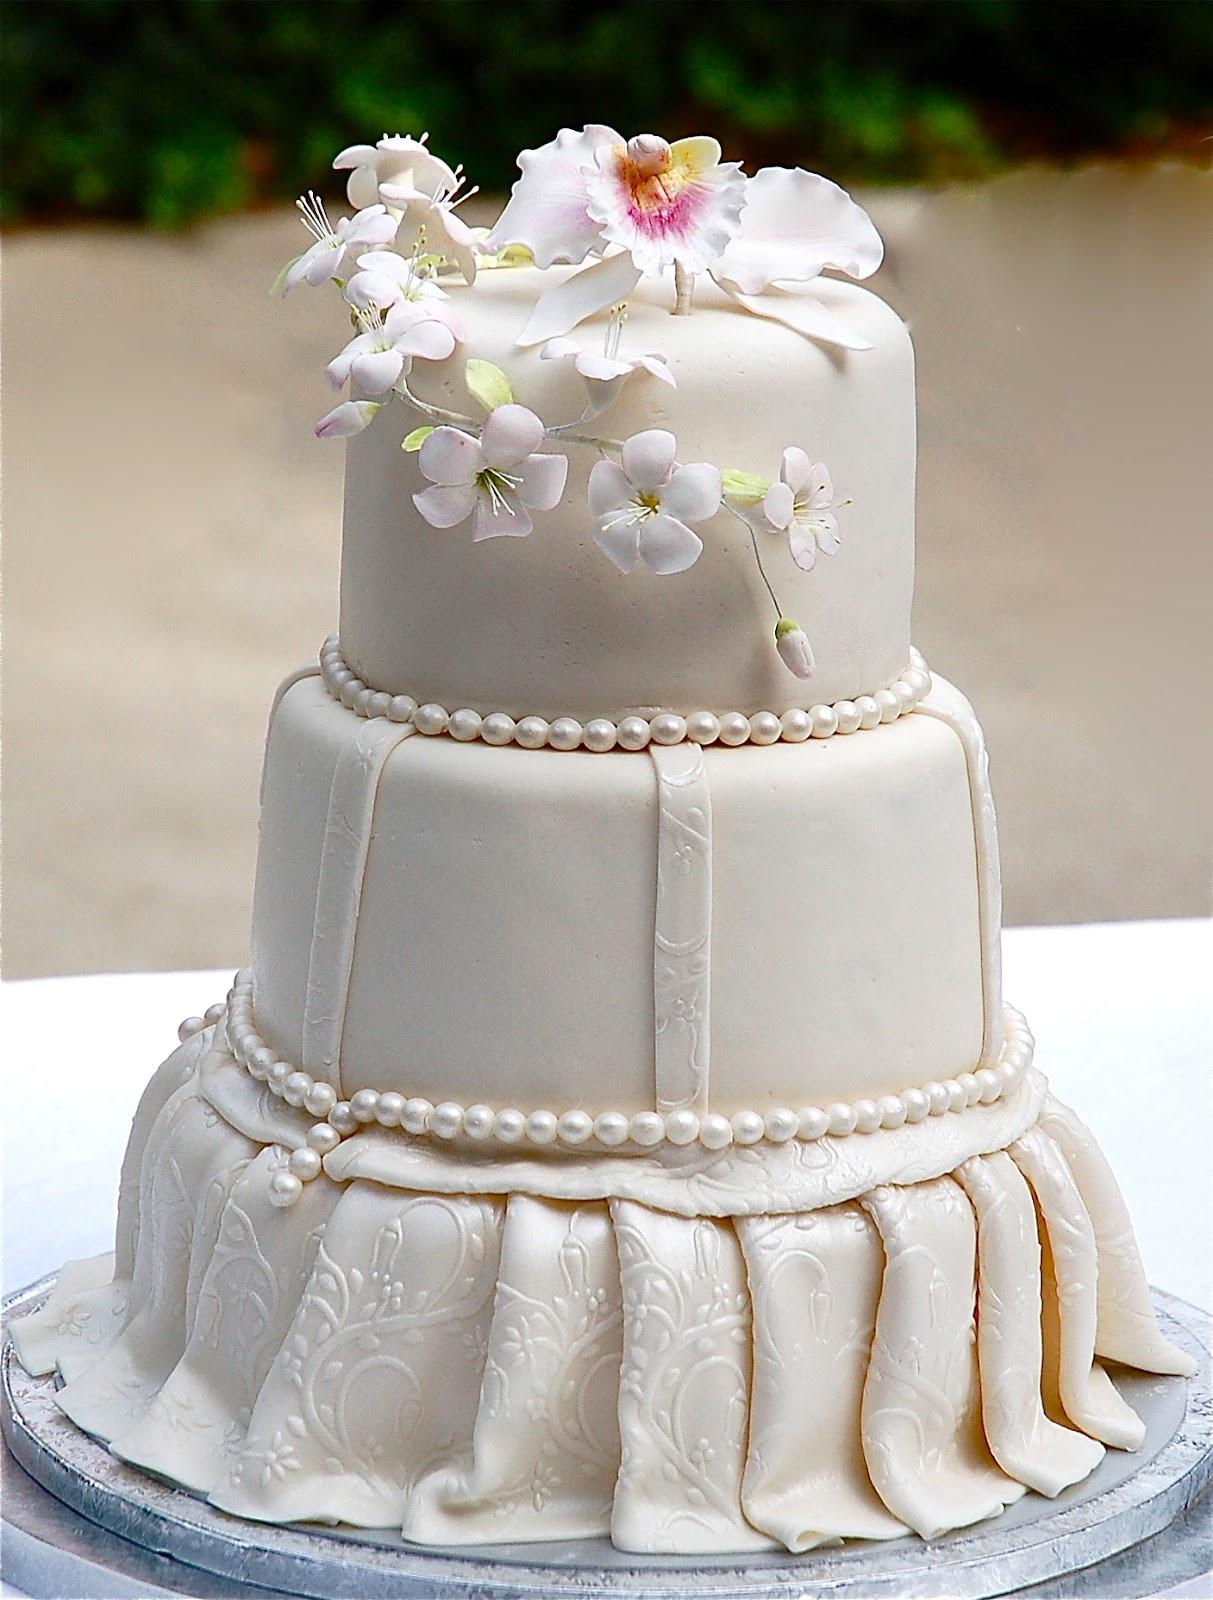 Wedding Cake Recipes  Amazing Dessert Recipes Wedding Cake with a Textured